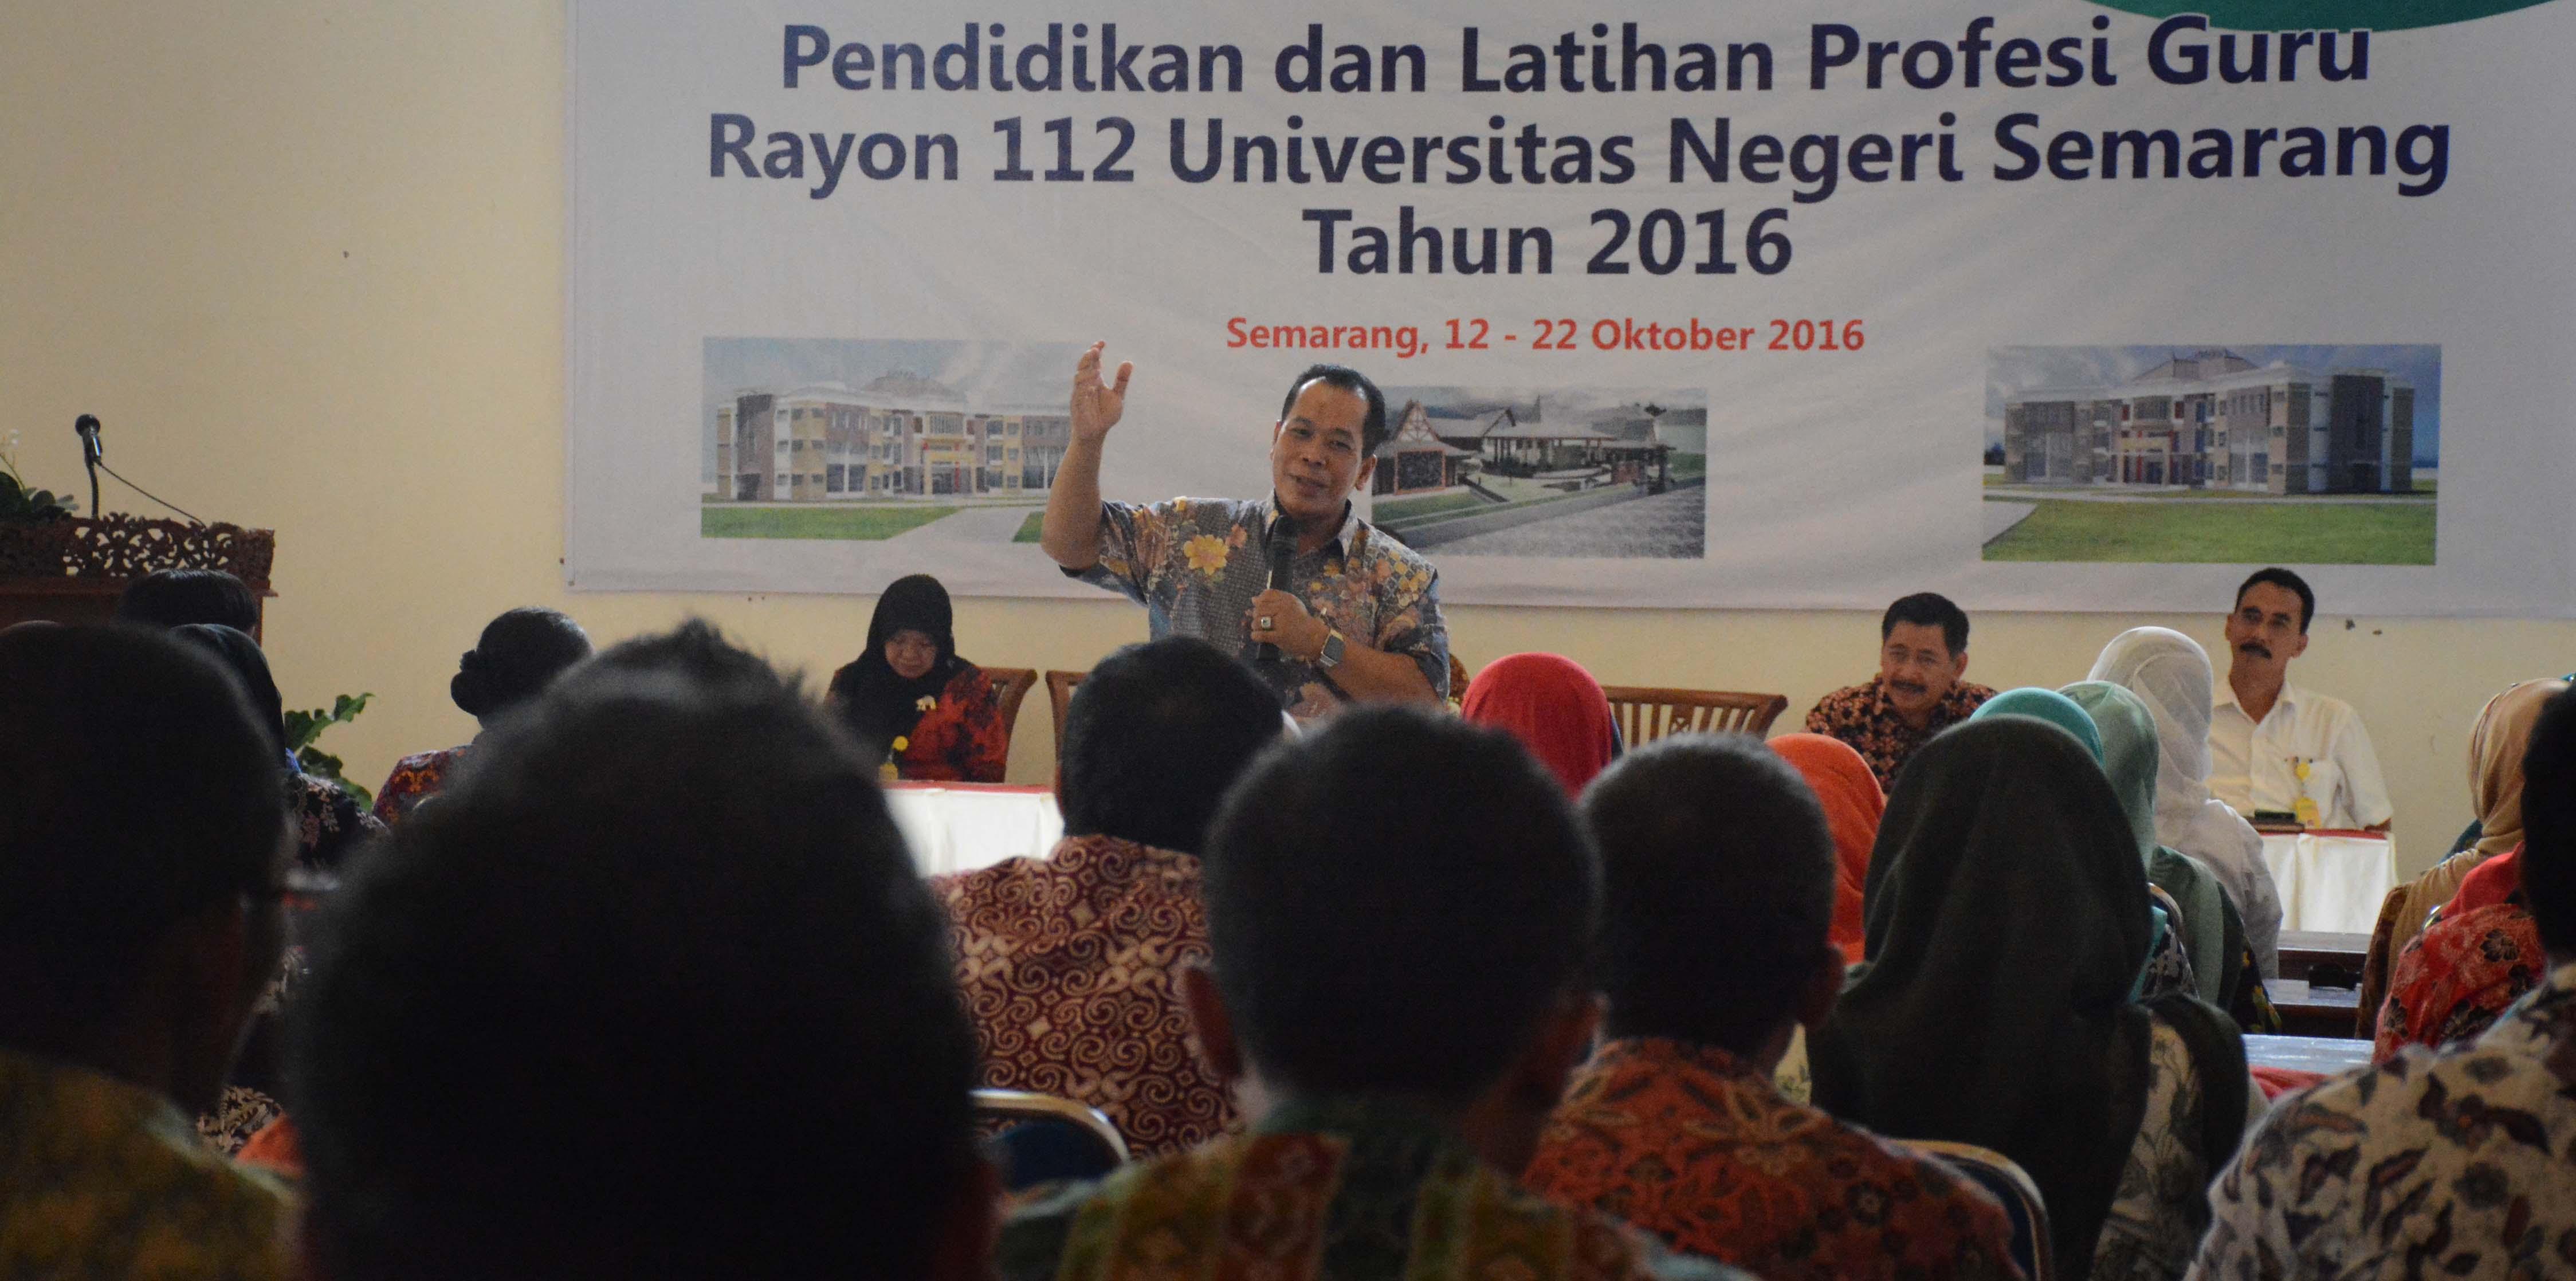 Pembukaan PLPG, Etika Guru Kunci Sukses Pendidikan